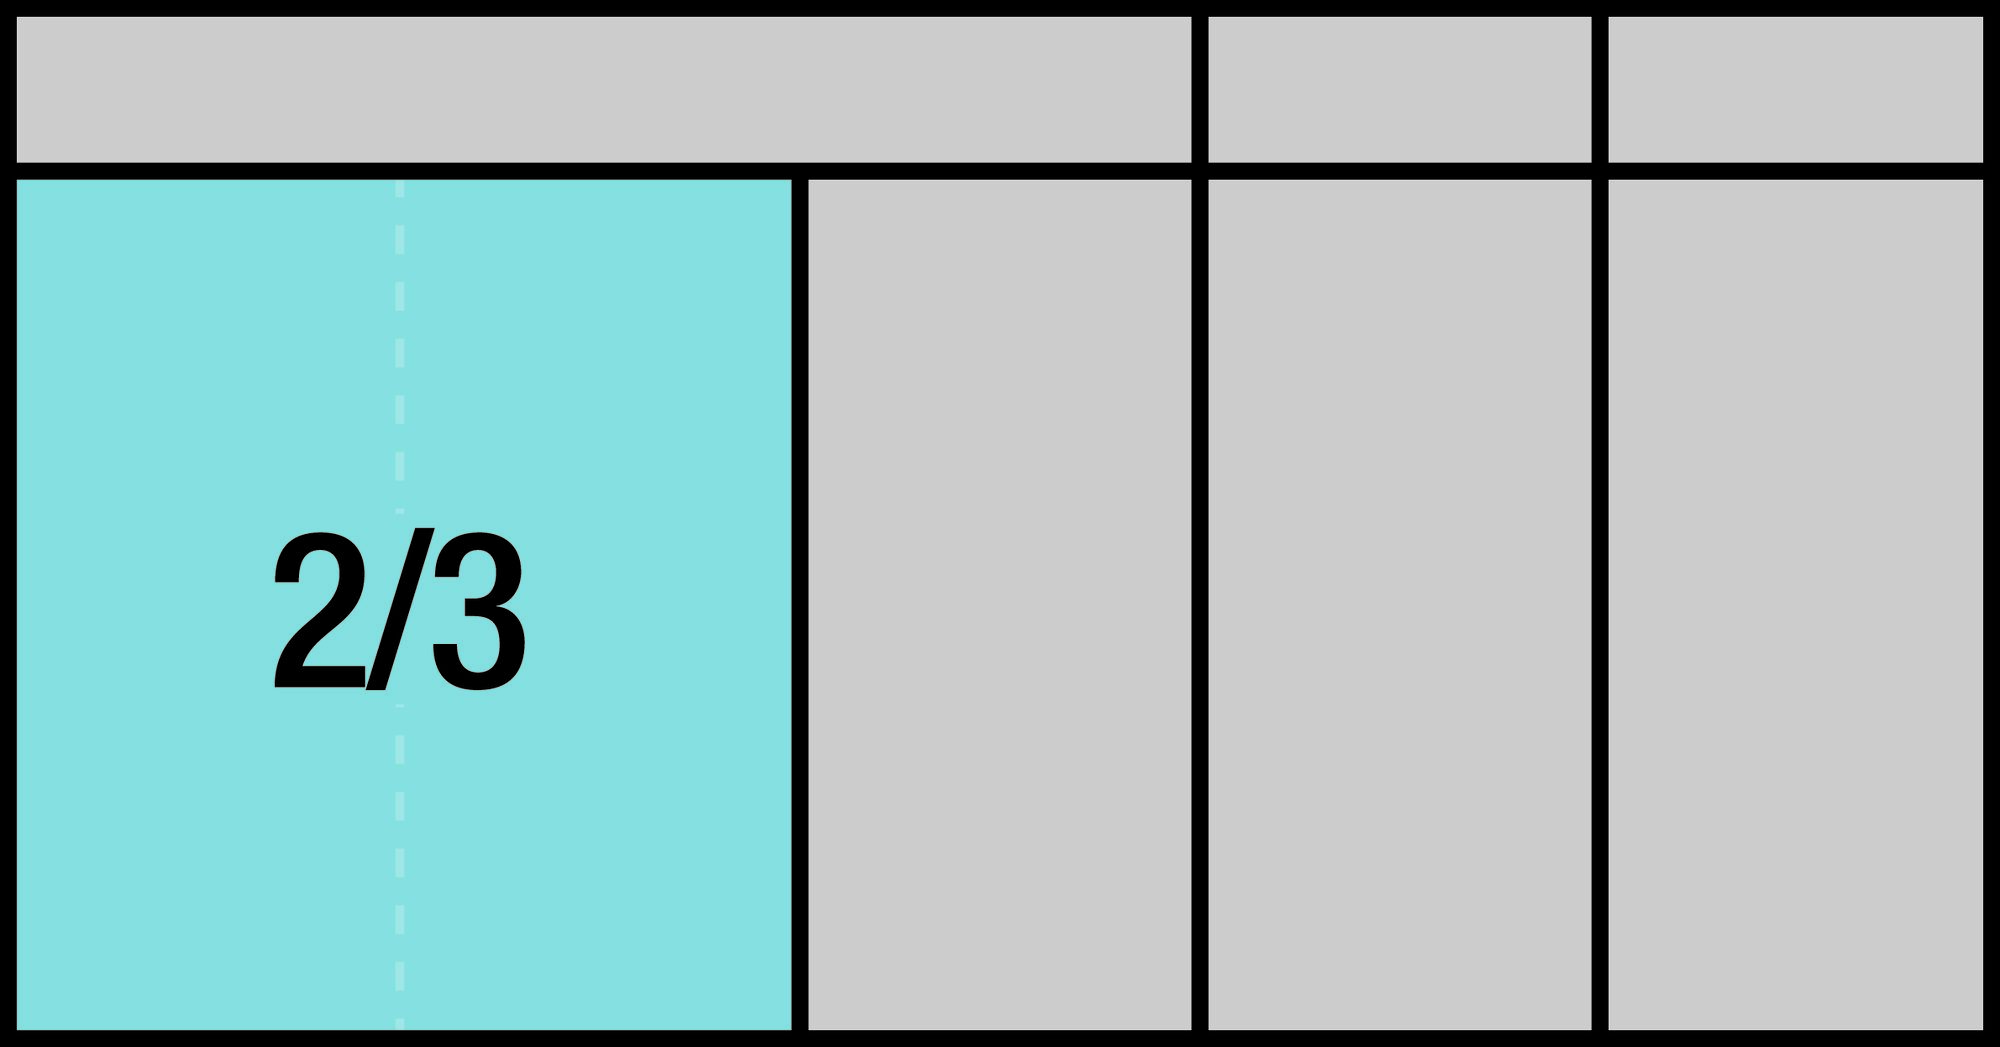 HAZET Schraubendreher Satz 163-100/13 ∙ Pozidriv Profil PZ, Kreuzschlitz Profil PH, Schlitz Profil ∙ Anzahl Werkzeuge: 13